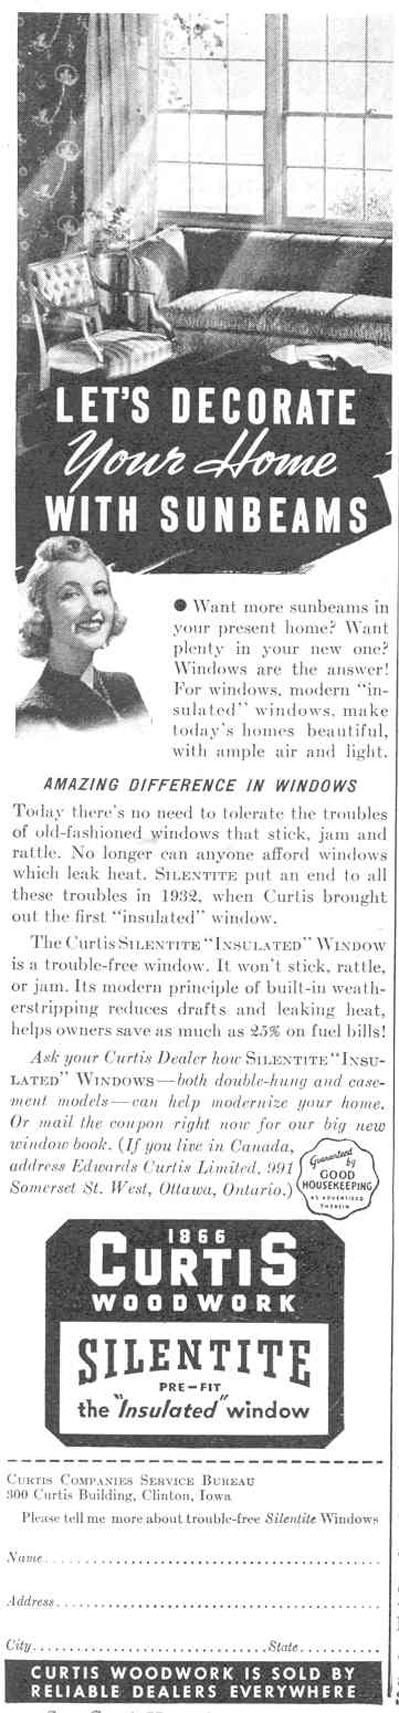 CURTIS SILENTITE INSULATED WINDOWS GOOD HOUSEKEEPING 03/01/1940 p. 172